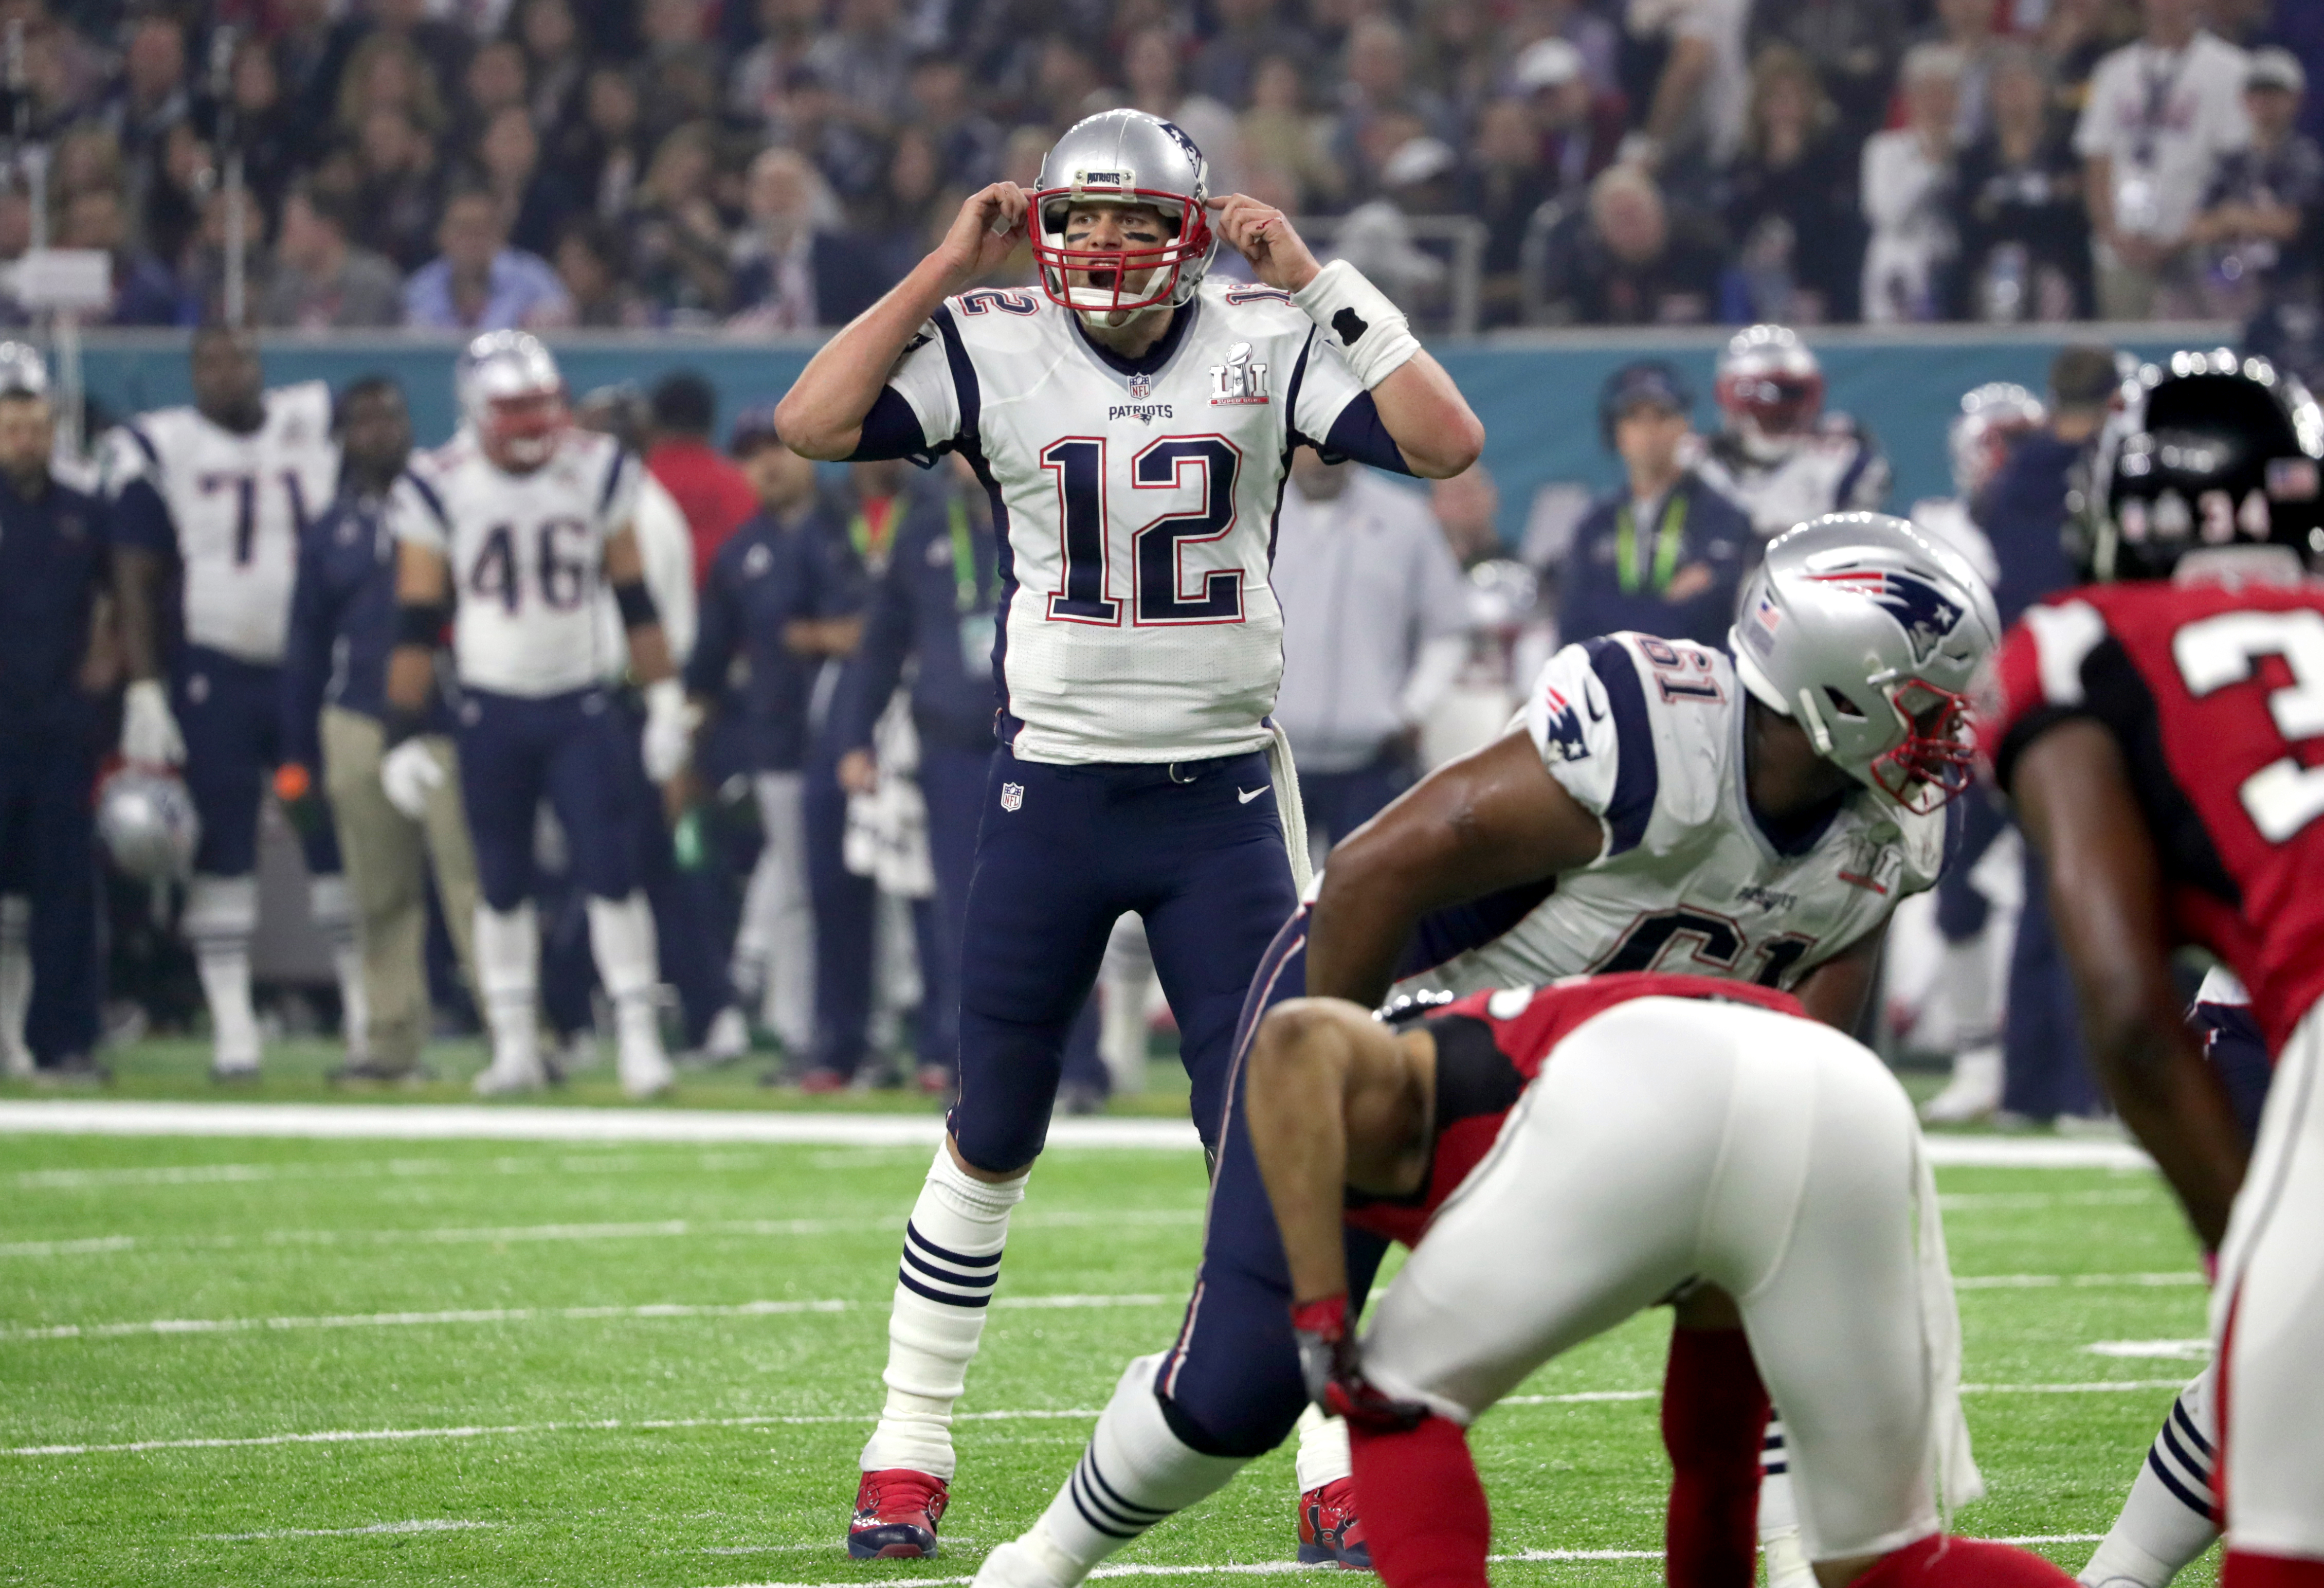 Stolen Tom Brady jersey worth half a million, police report says ...